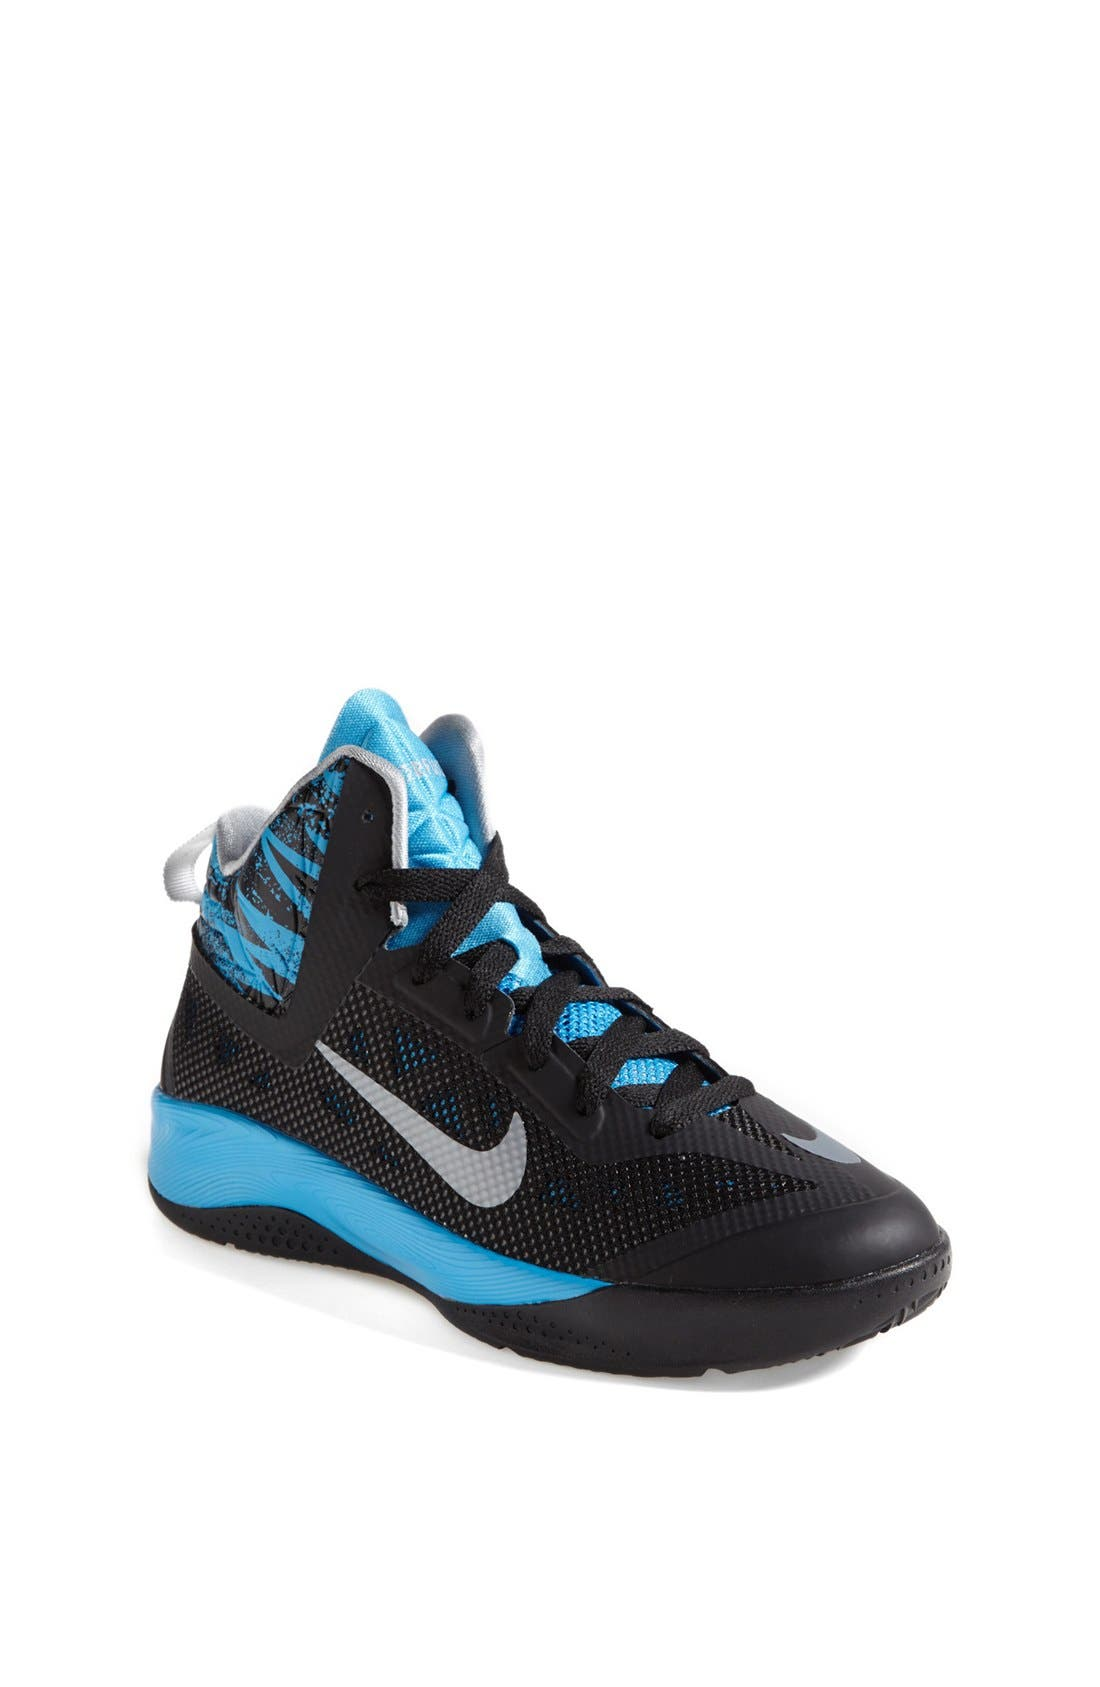 Alternate Image 1 Selected - Nike 'Hyperfuse 2013' Basketball Shoe (Big Kid)